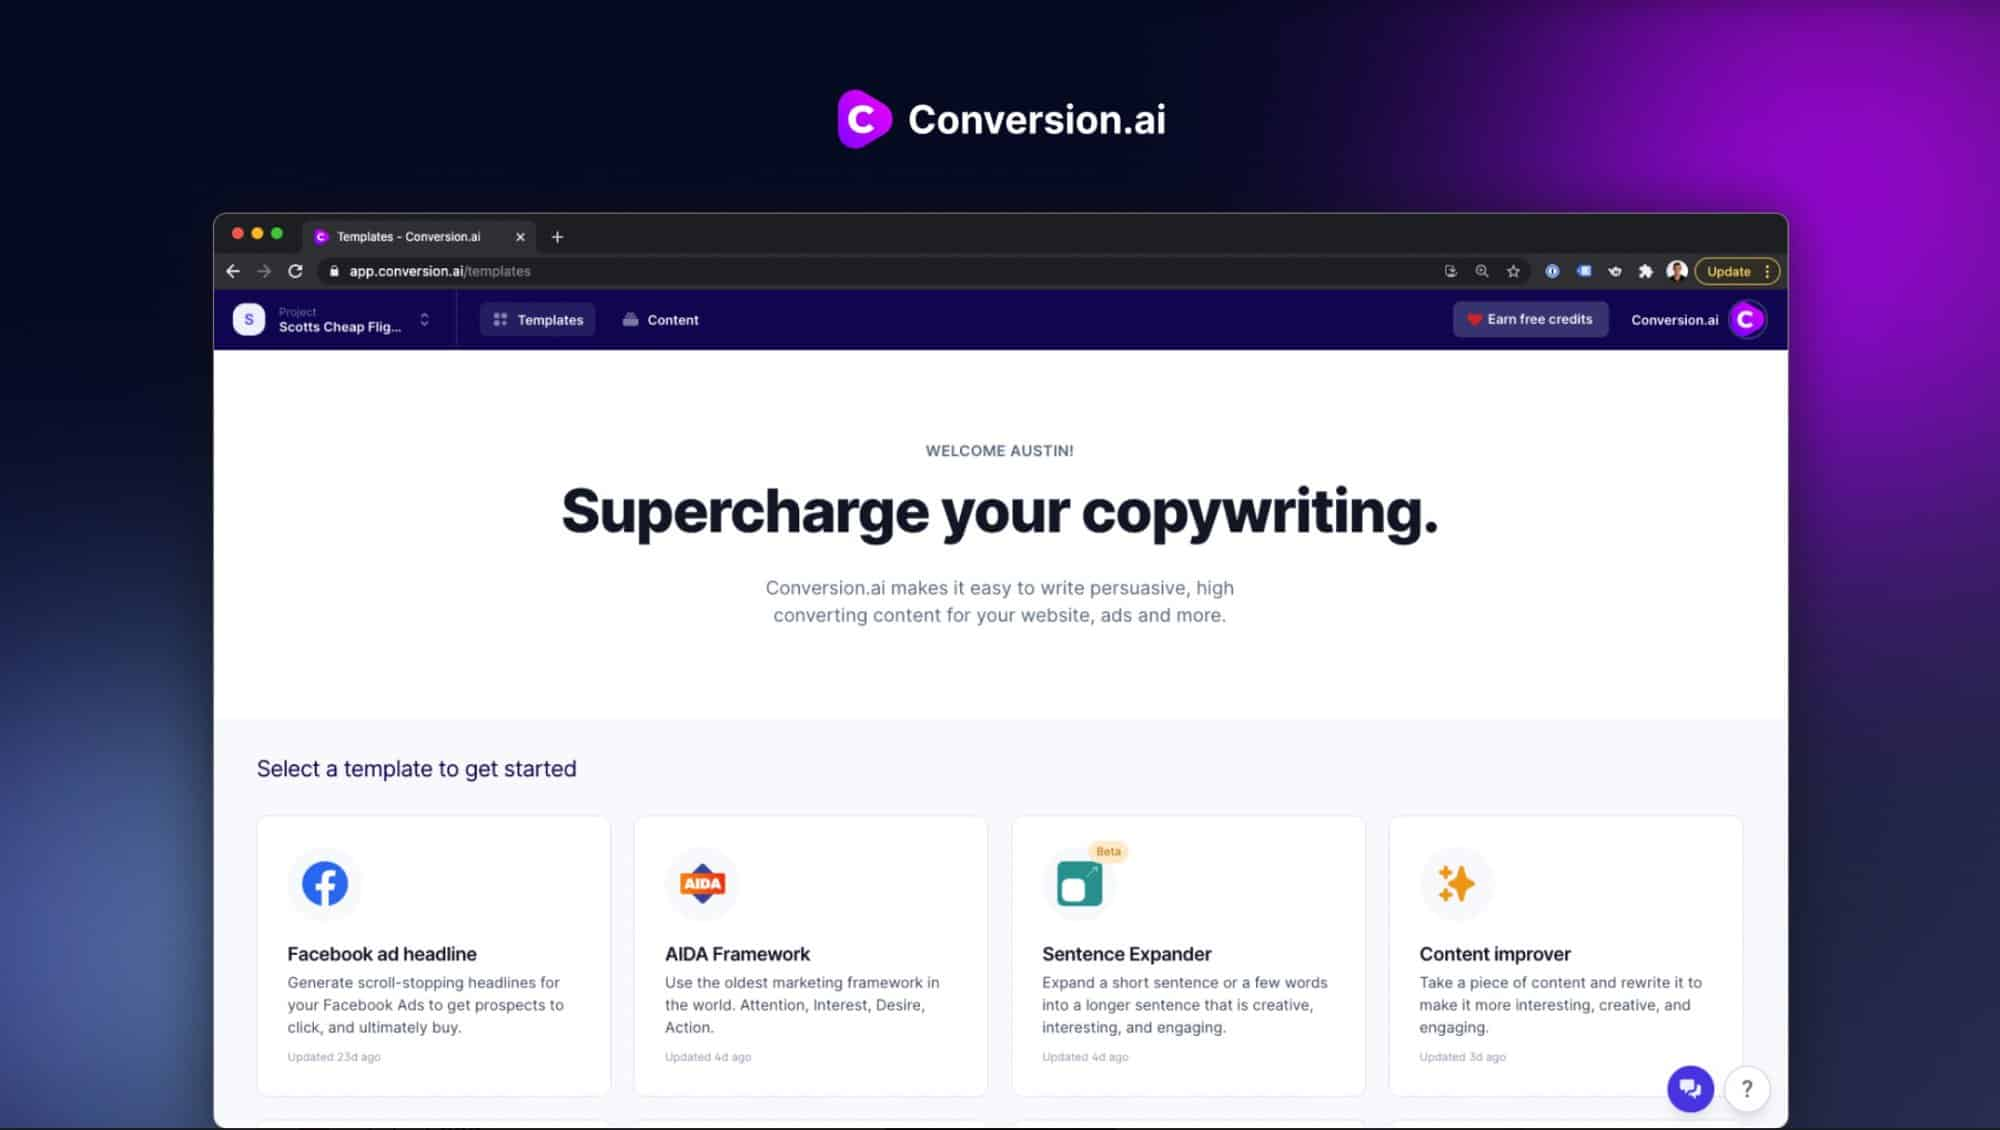 conversion.ai dashboard - comparewise